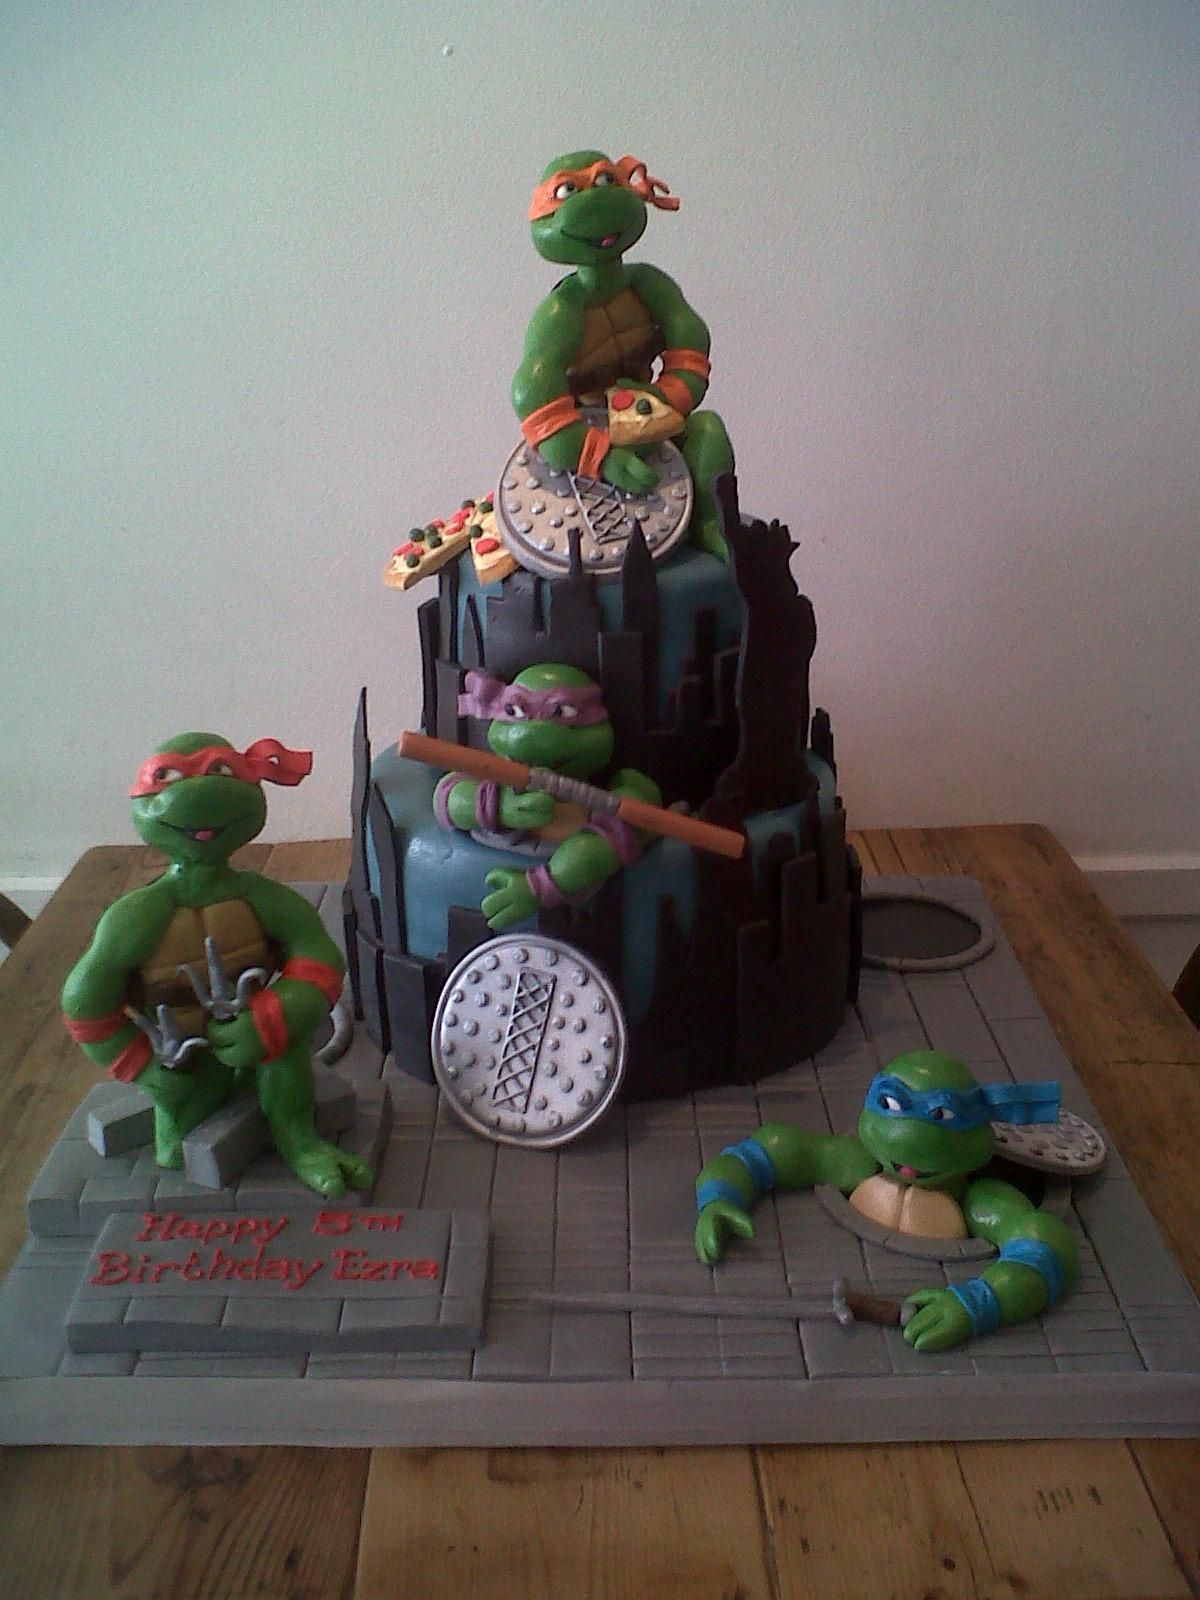 Astounding Teenage Mutant Ninja Turtle Cakes Cakes By Robin Funny Birthday Cards Online Bapapcheapnameinfo